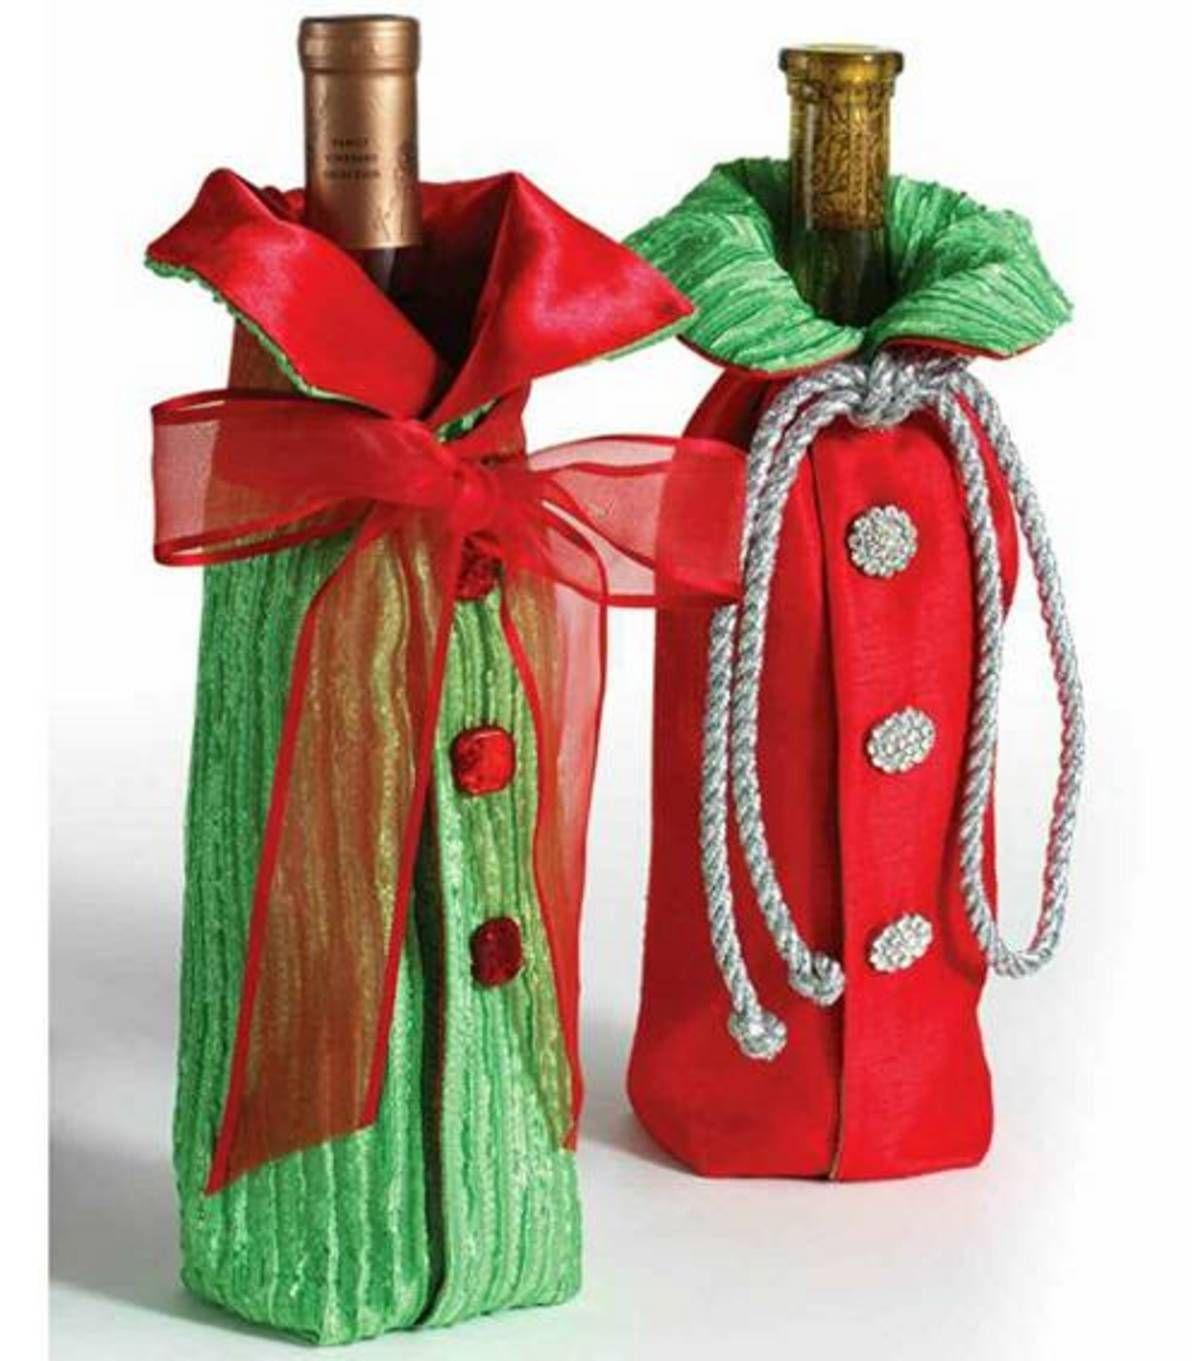 Wine Bottle Jackets At Joann Com Wine Bag Pattern Wine Bottle Gift Bag Wine Bottle Gift